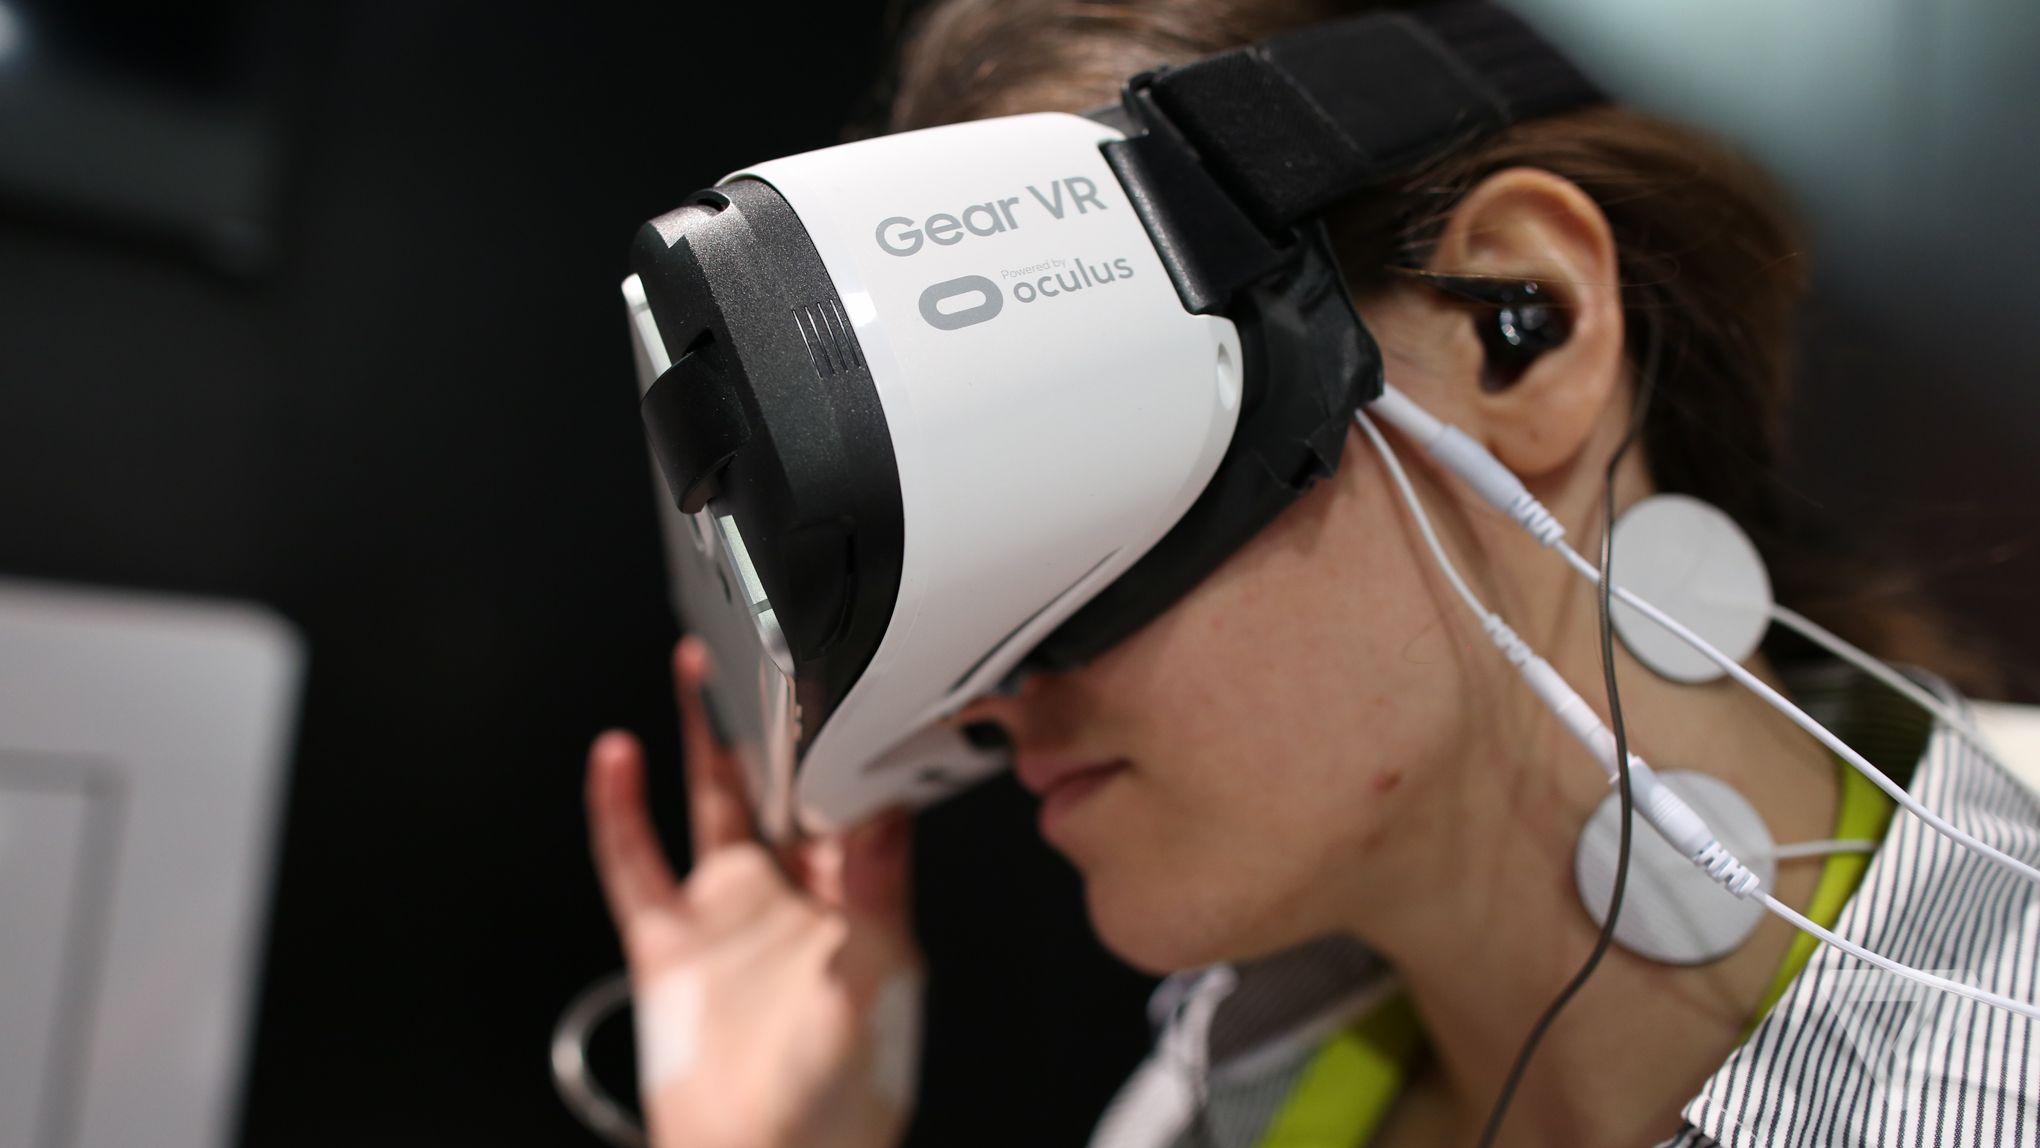 VR Oculus Empathy Virtual Reality